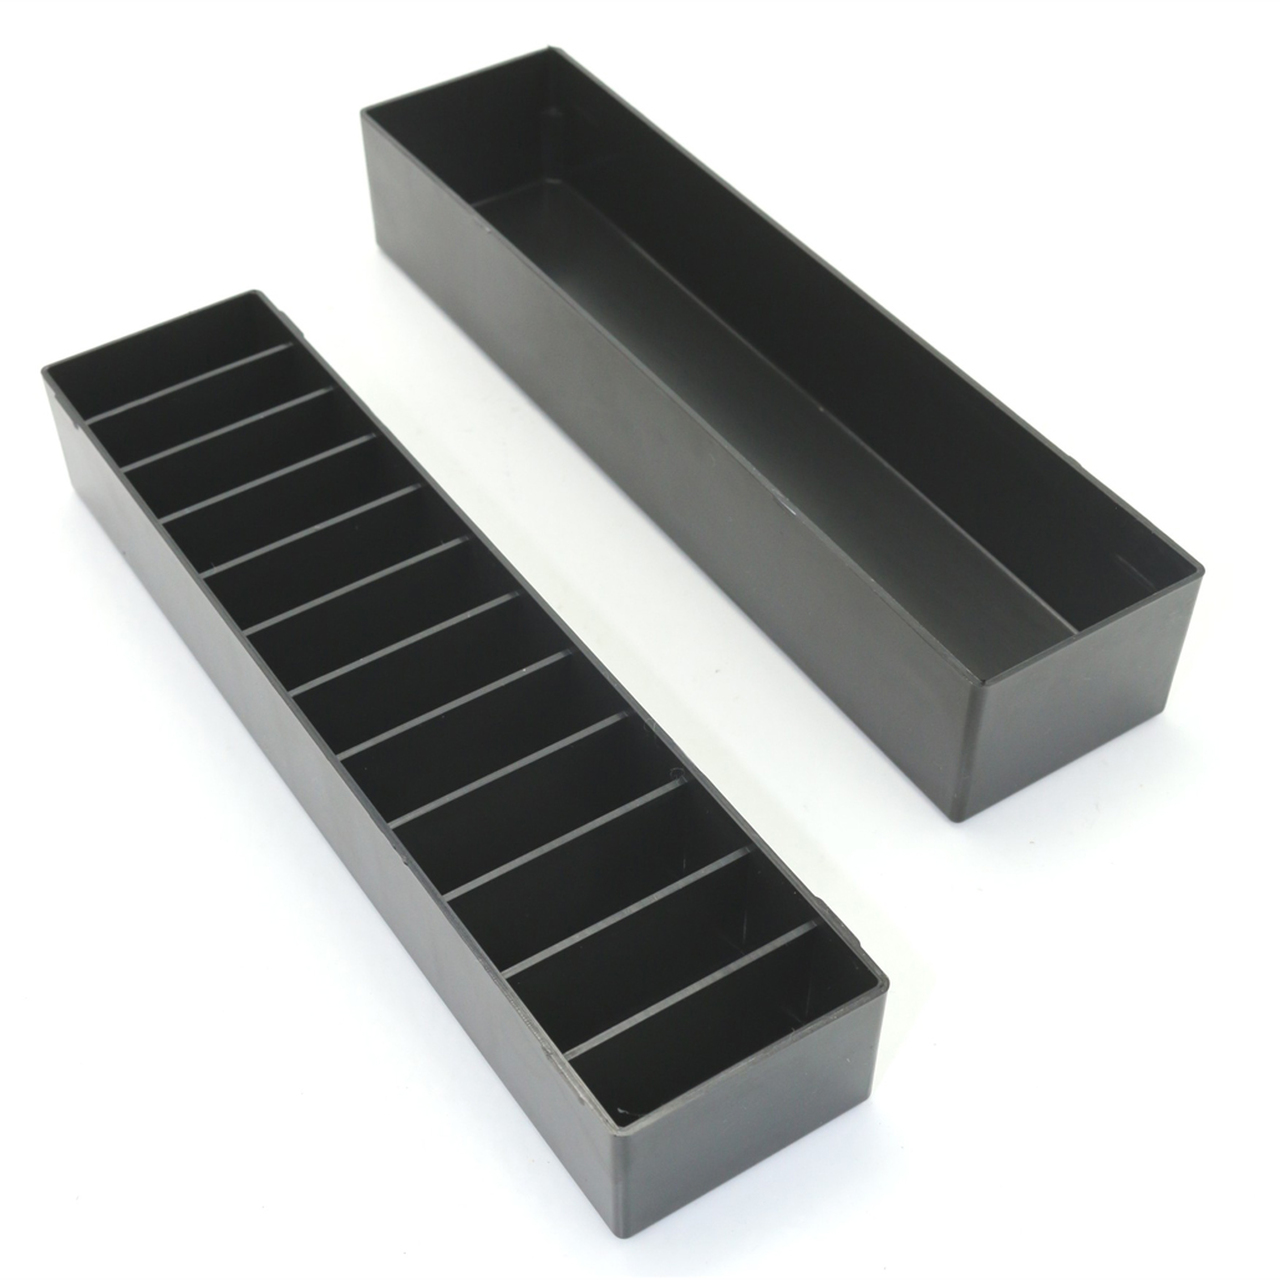 mini-blade-case-64715.1592202535.jpg